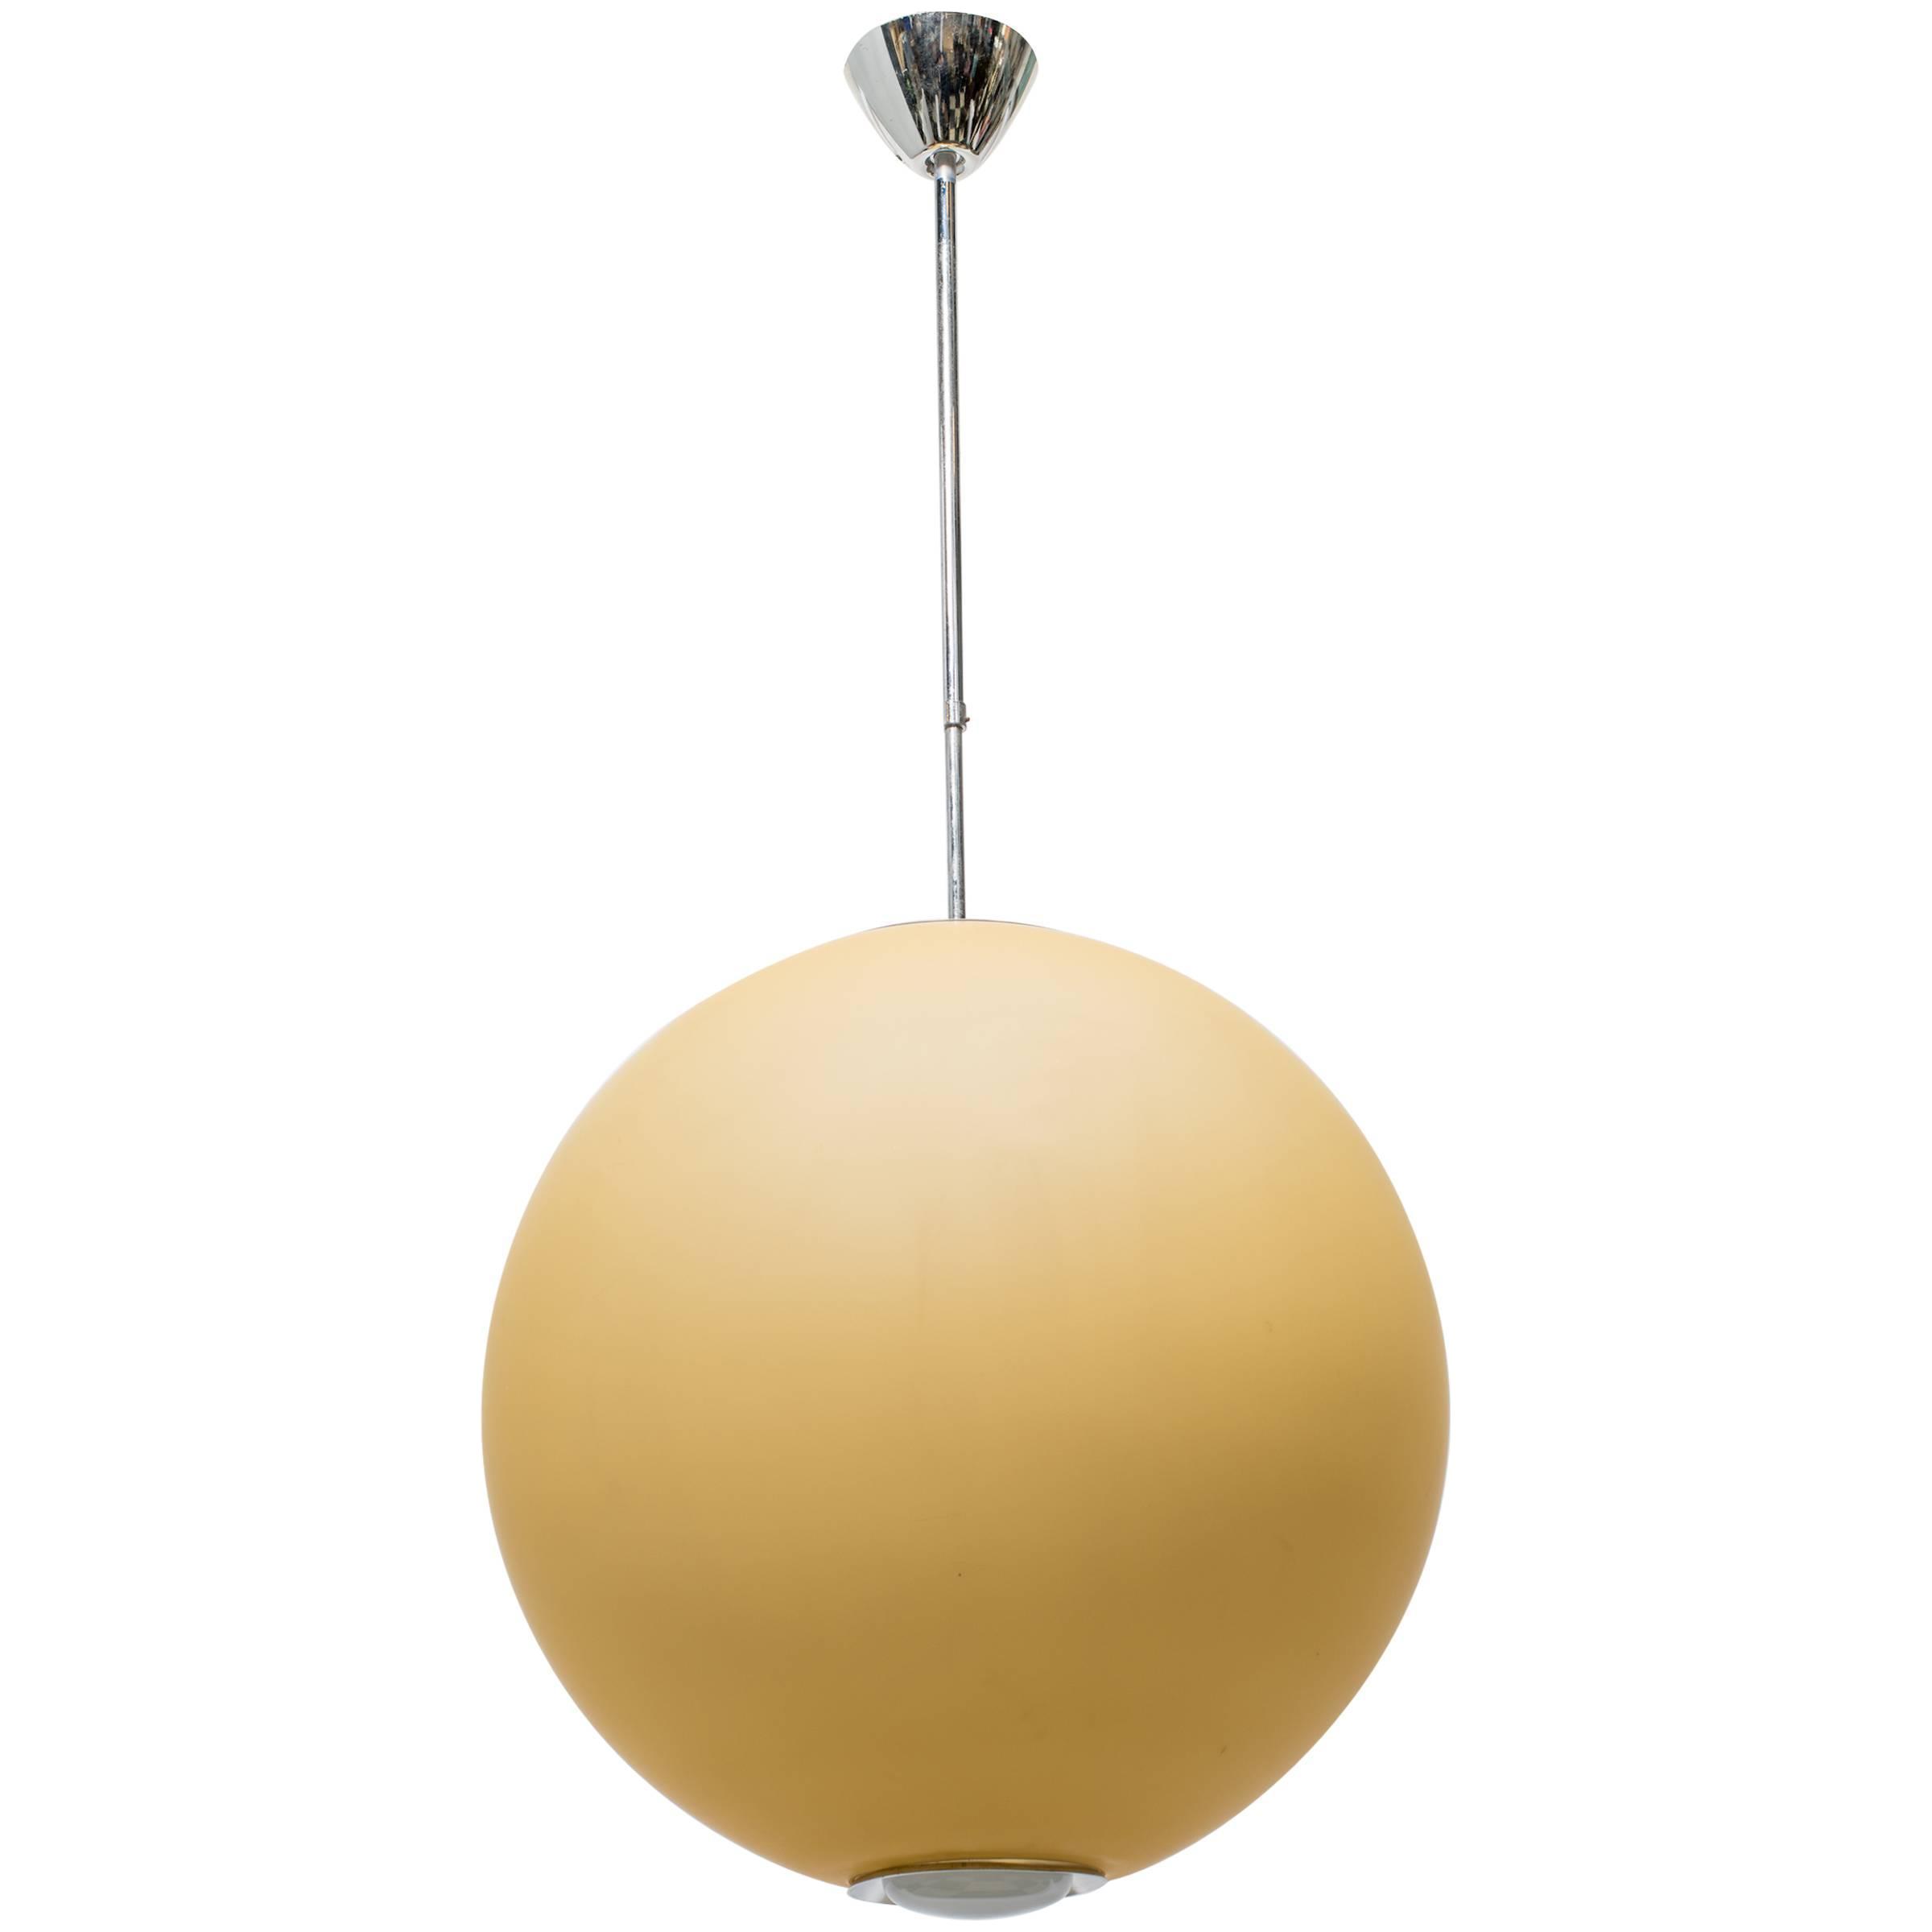 1960s glass orb chandelier